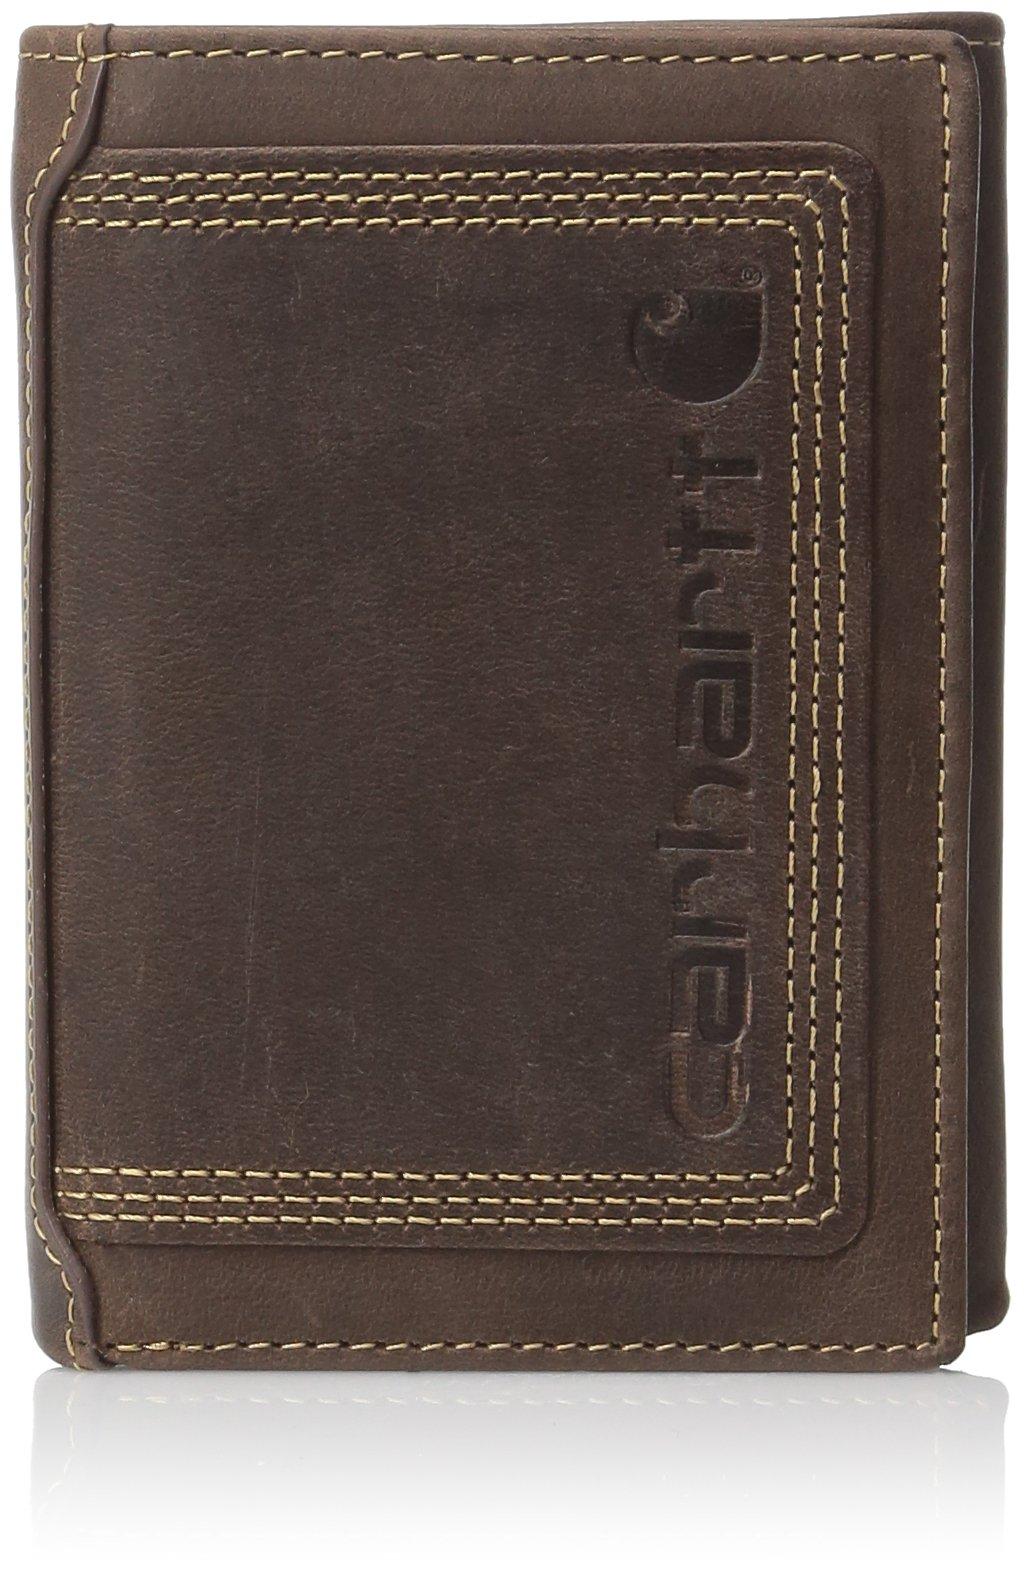 Carhartt Men's Trifold Wallet, Top Grain Brown, One Size by Carhartt